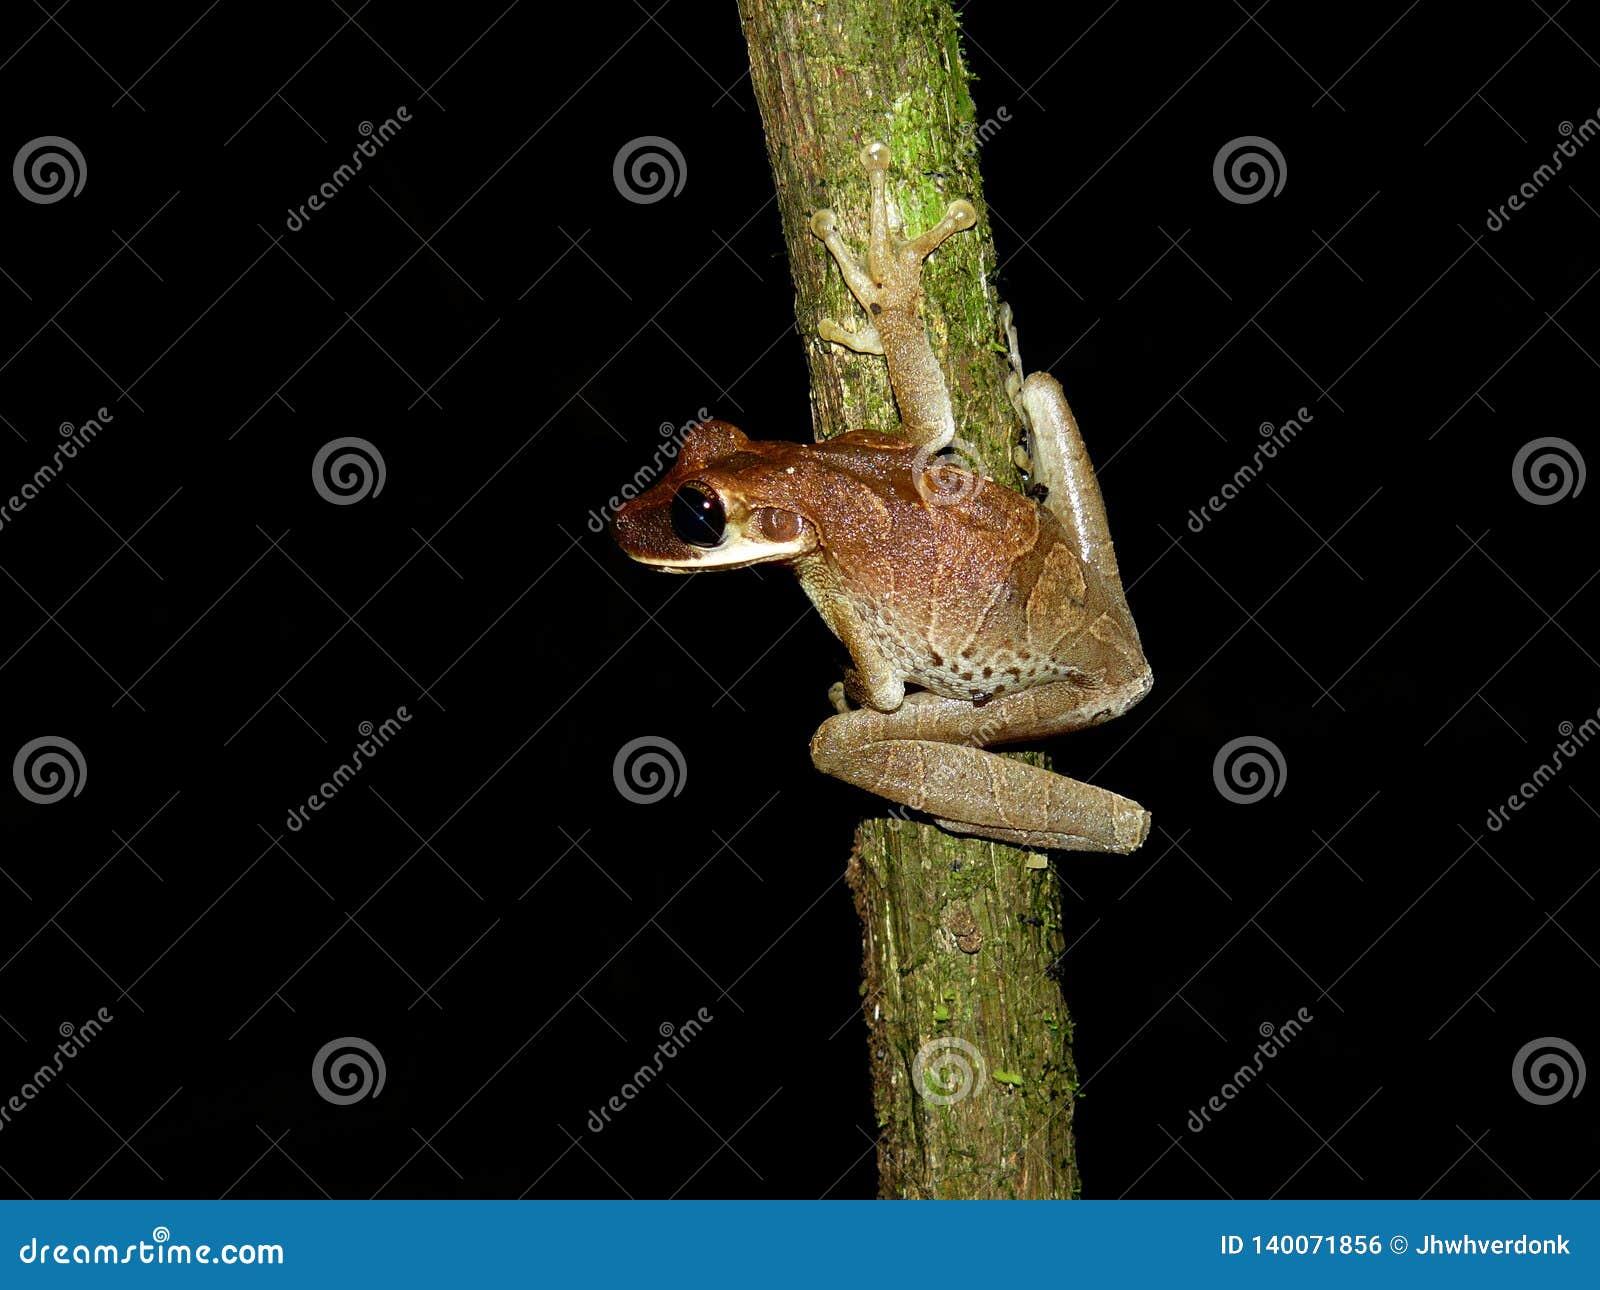 Treefrog遇到了在一nightwalk期间在密林